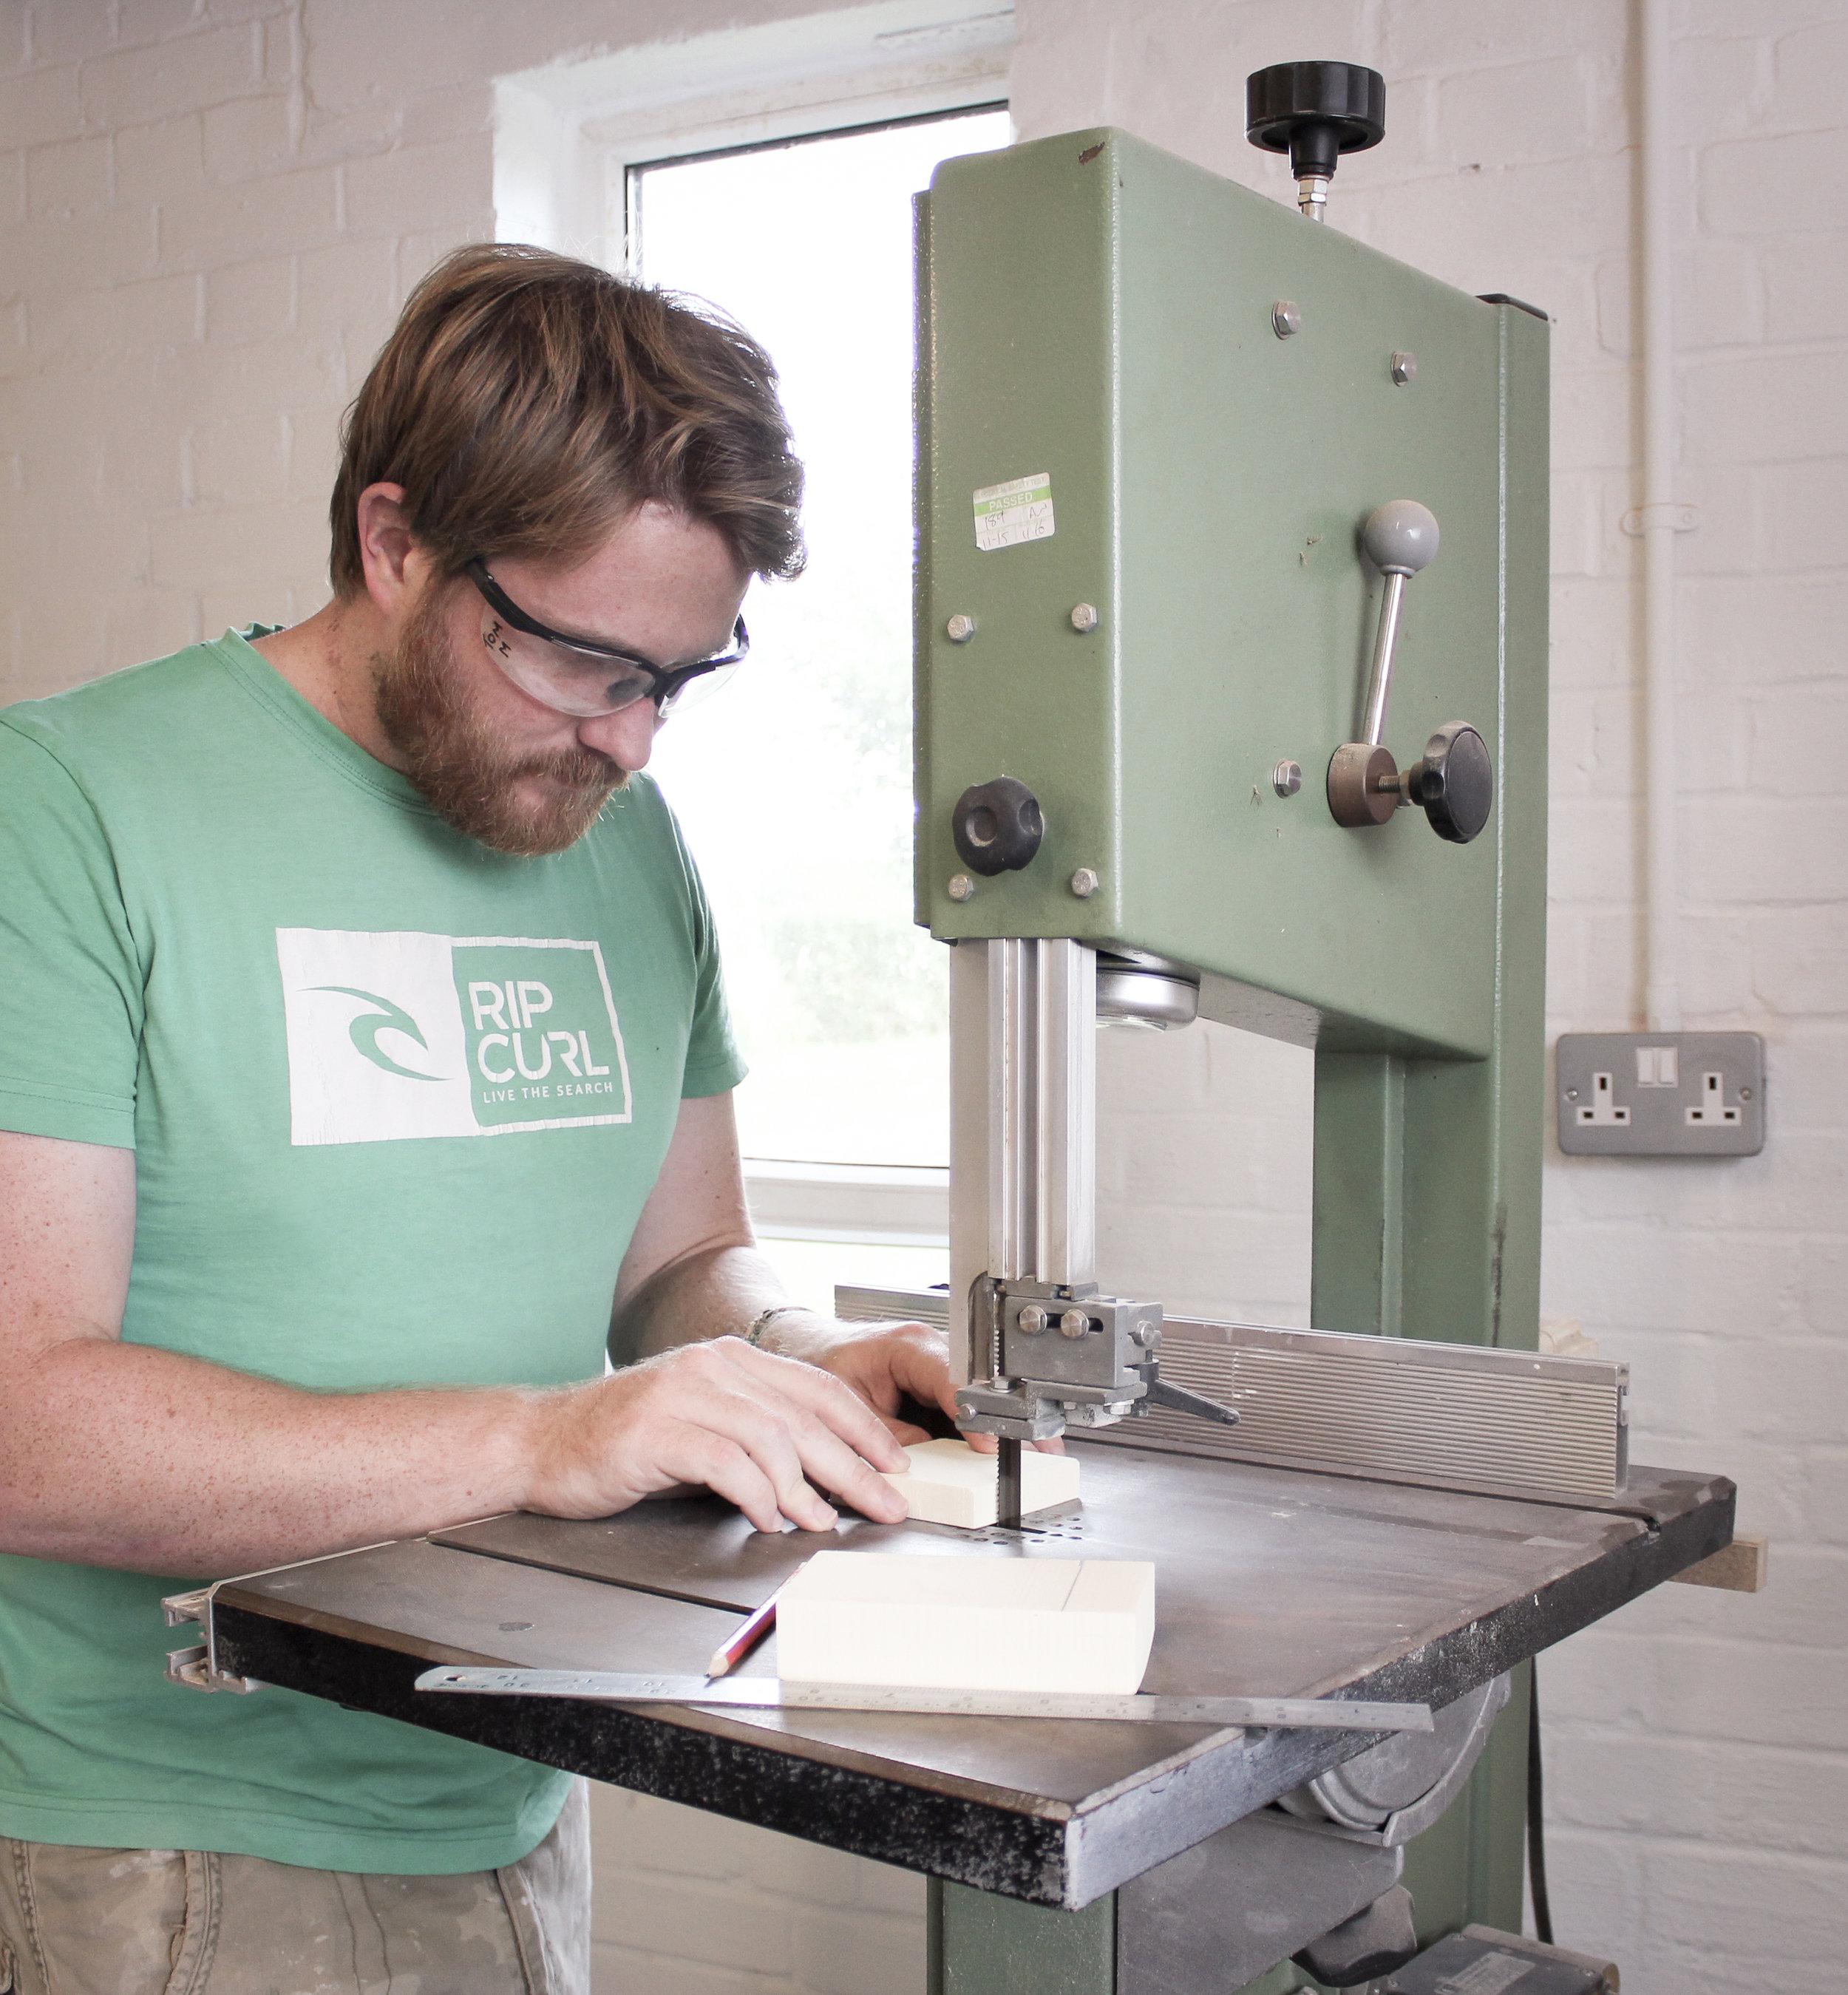 Product Design Bristol - Foam Prototyping